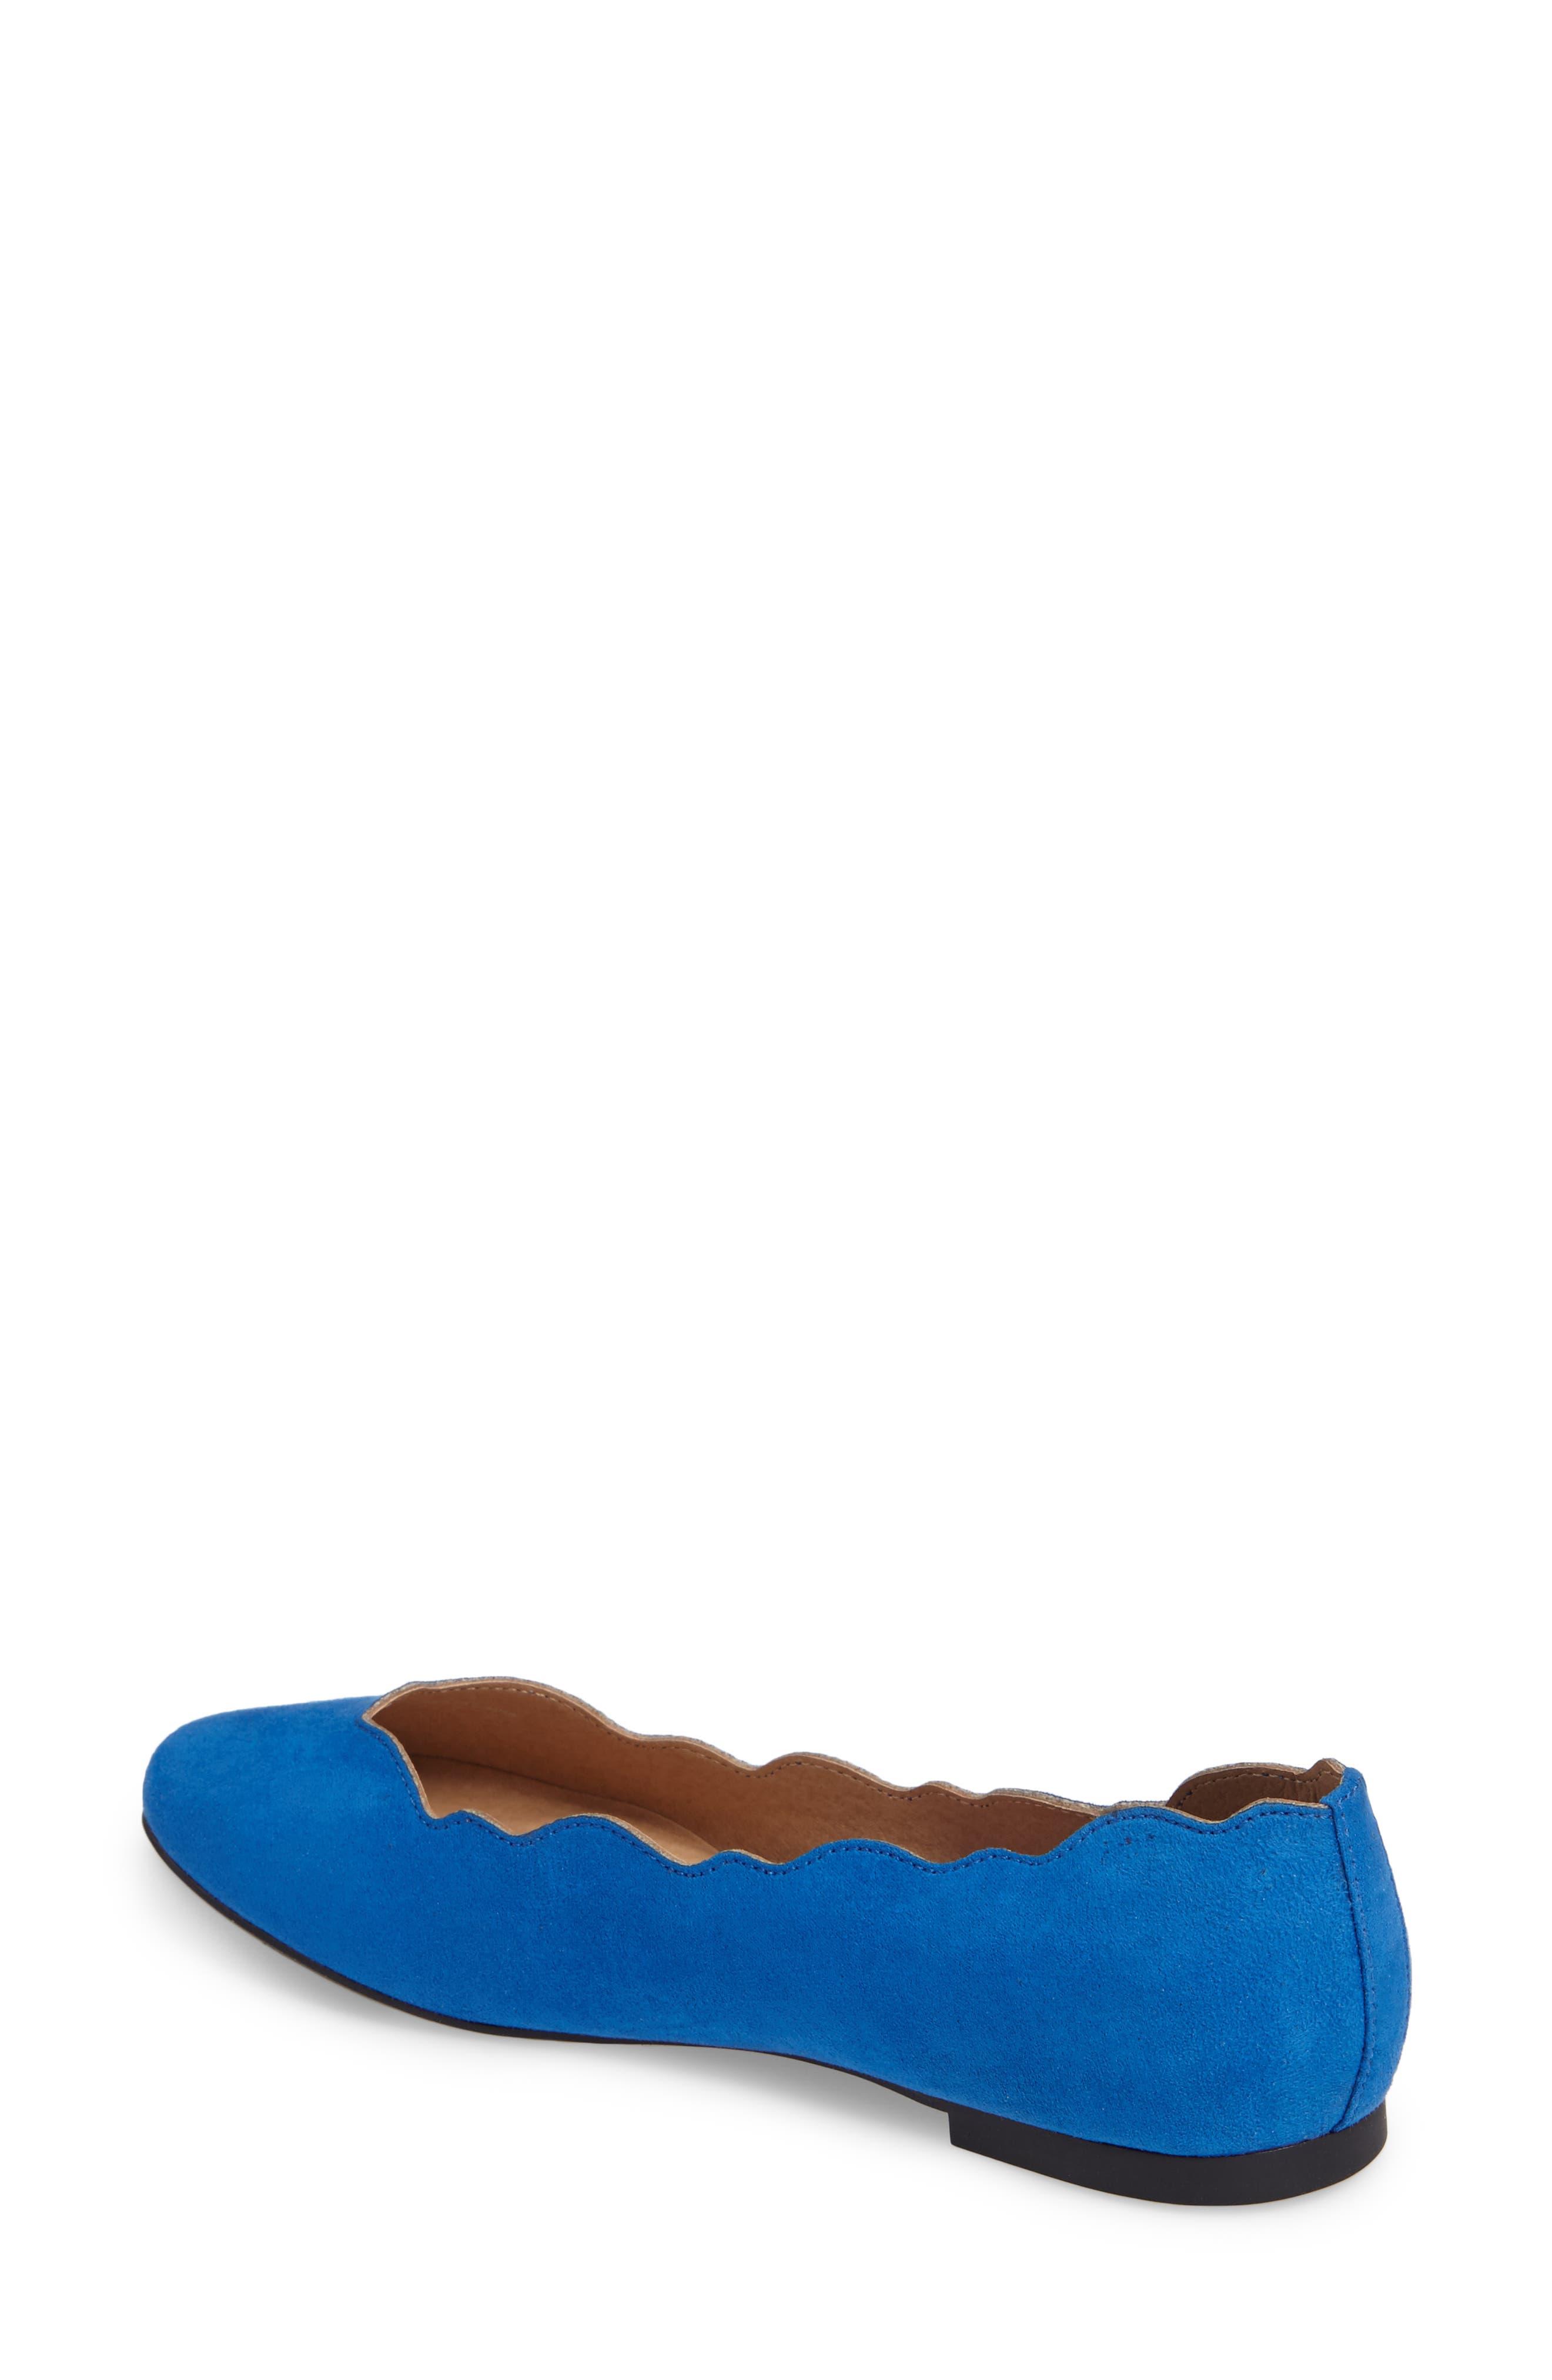 Tallye Ballet Flat,                             Alternate thumbnail 2, color,                             Royal Blue Faux Suede